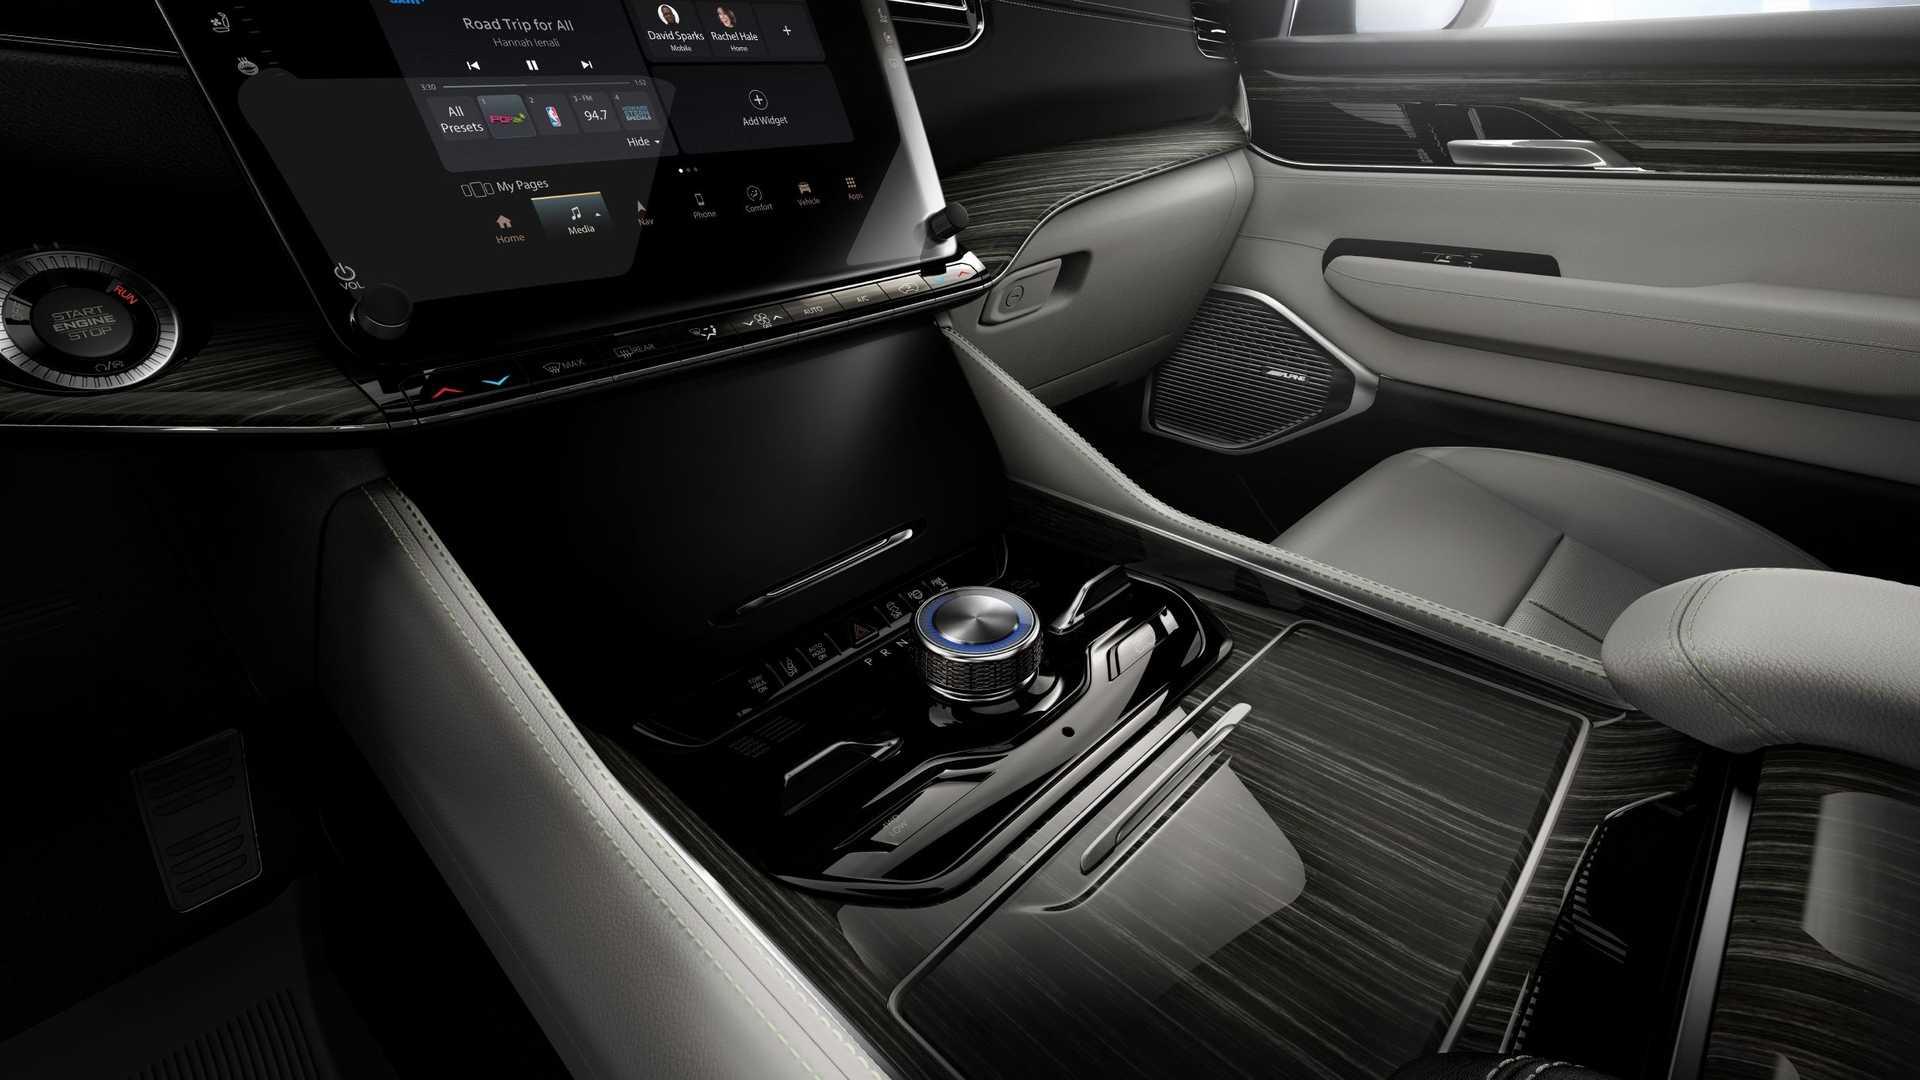 2022-jeep-grand-wagoneer-interior-center-stack-3